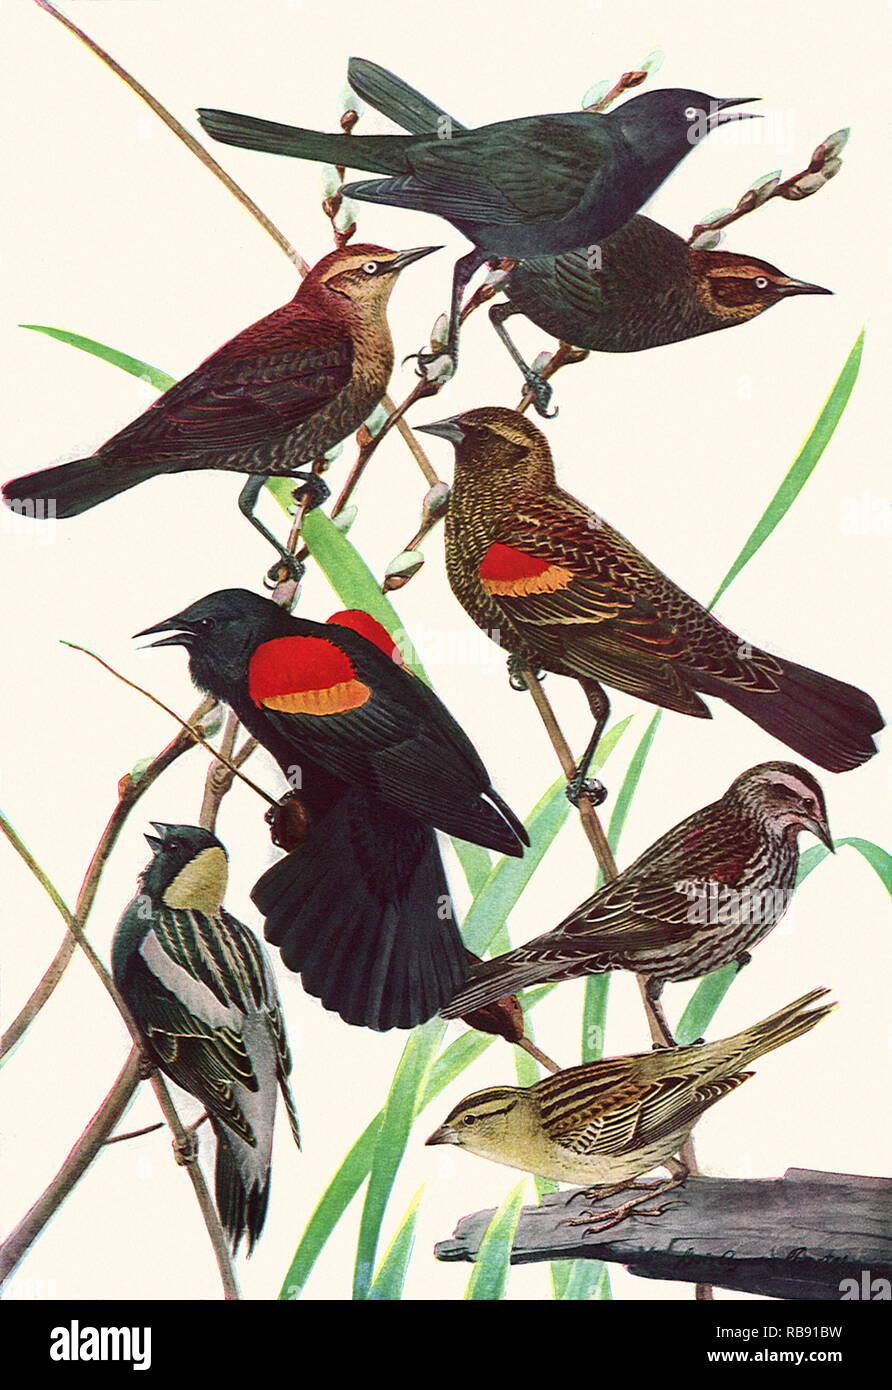 Blackbirds and Bobolinks - Stock Image